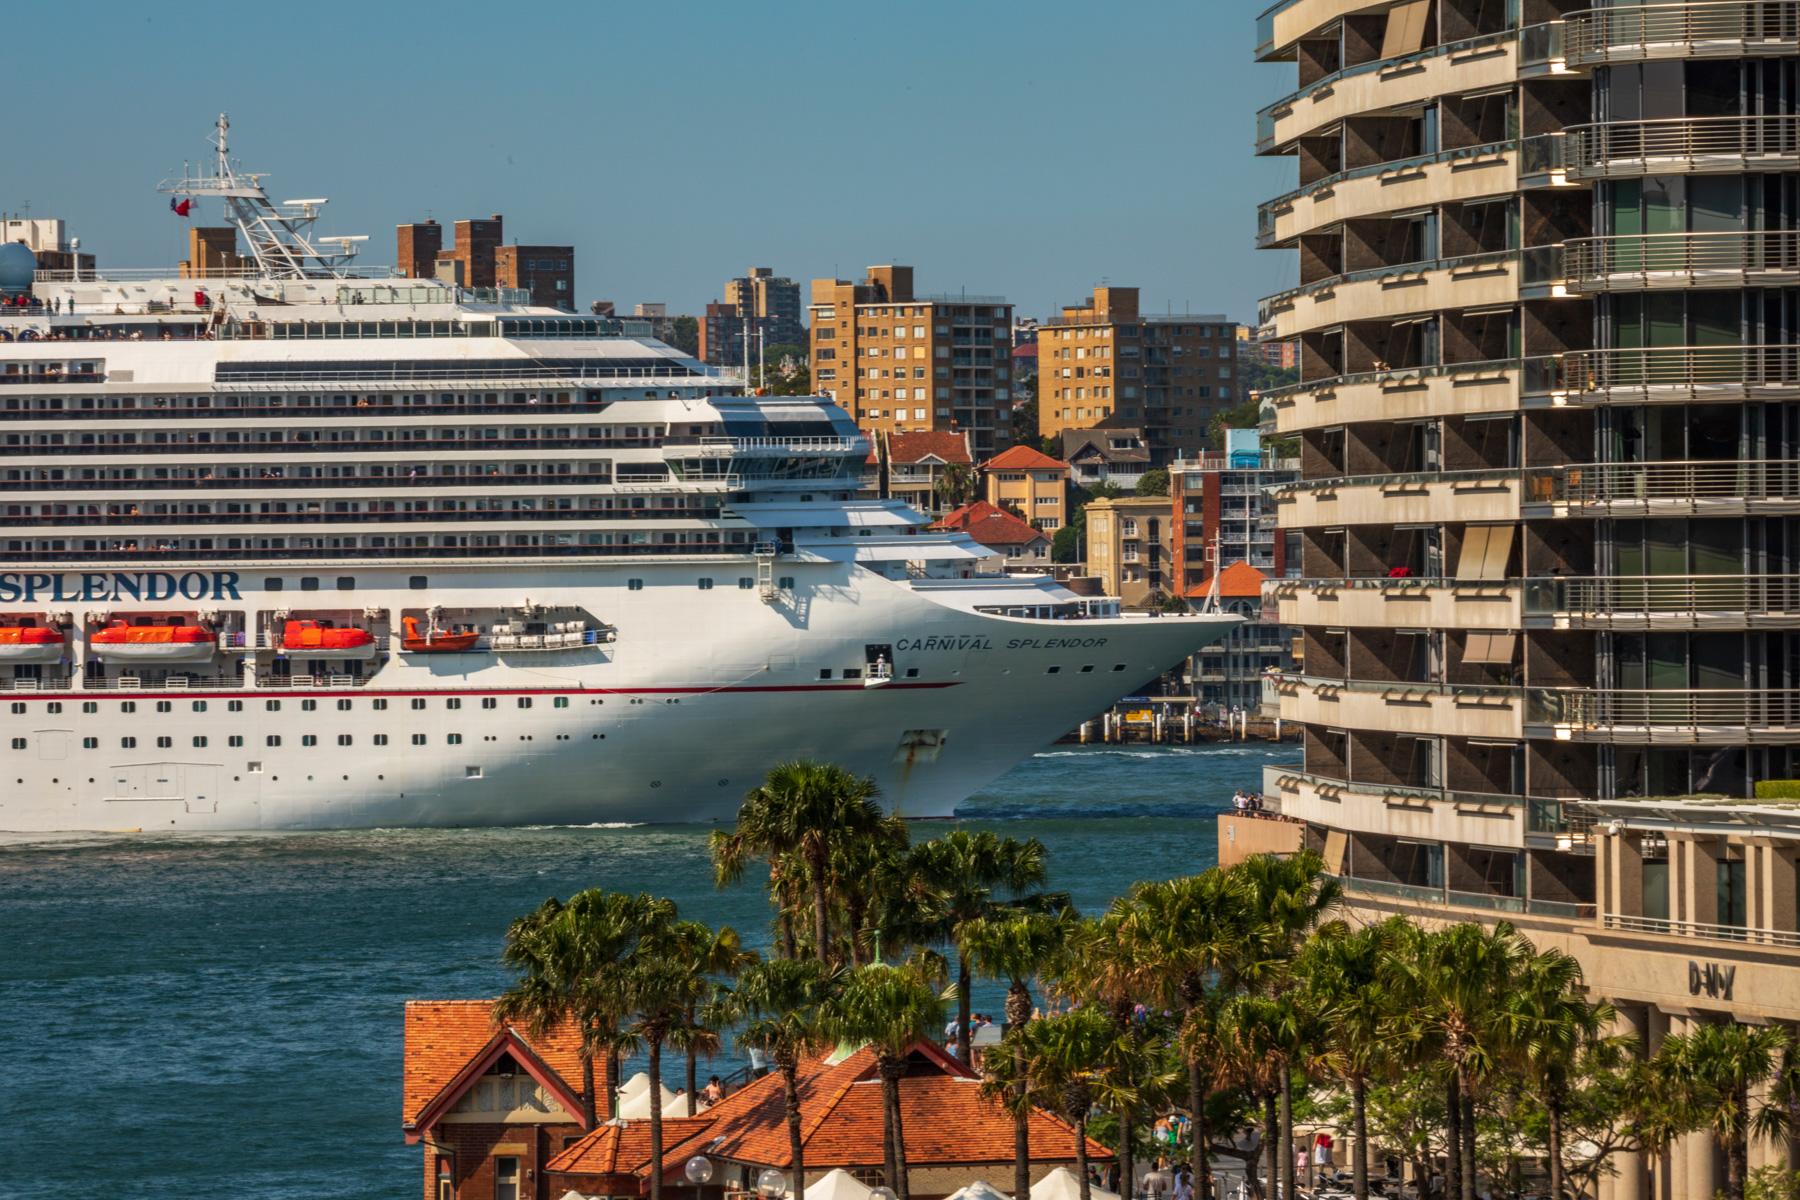 Passenger liner kissing the building, Sydney Harbour, Australia